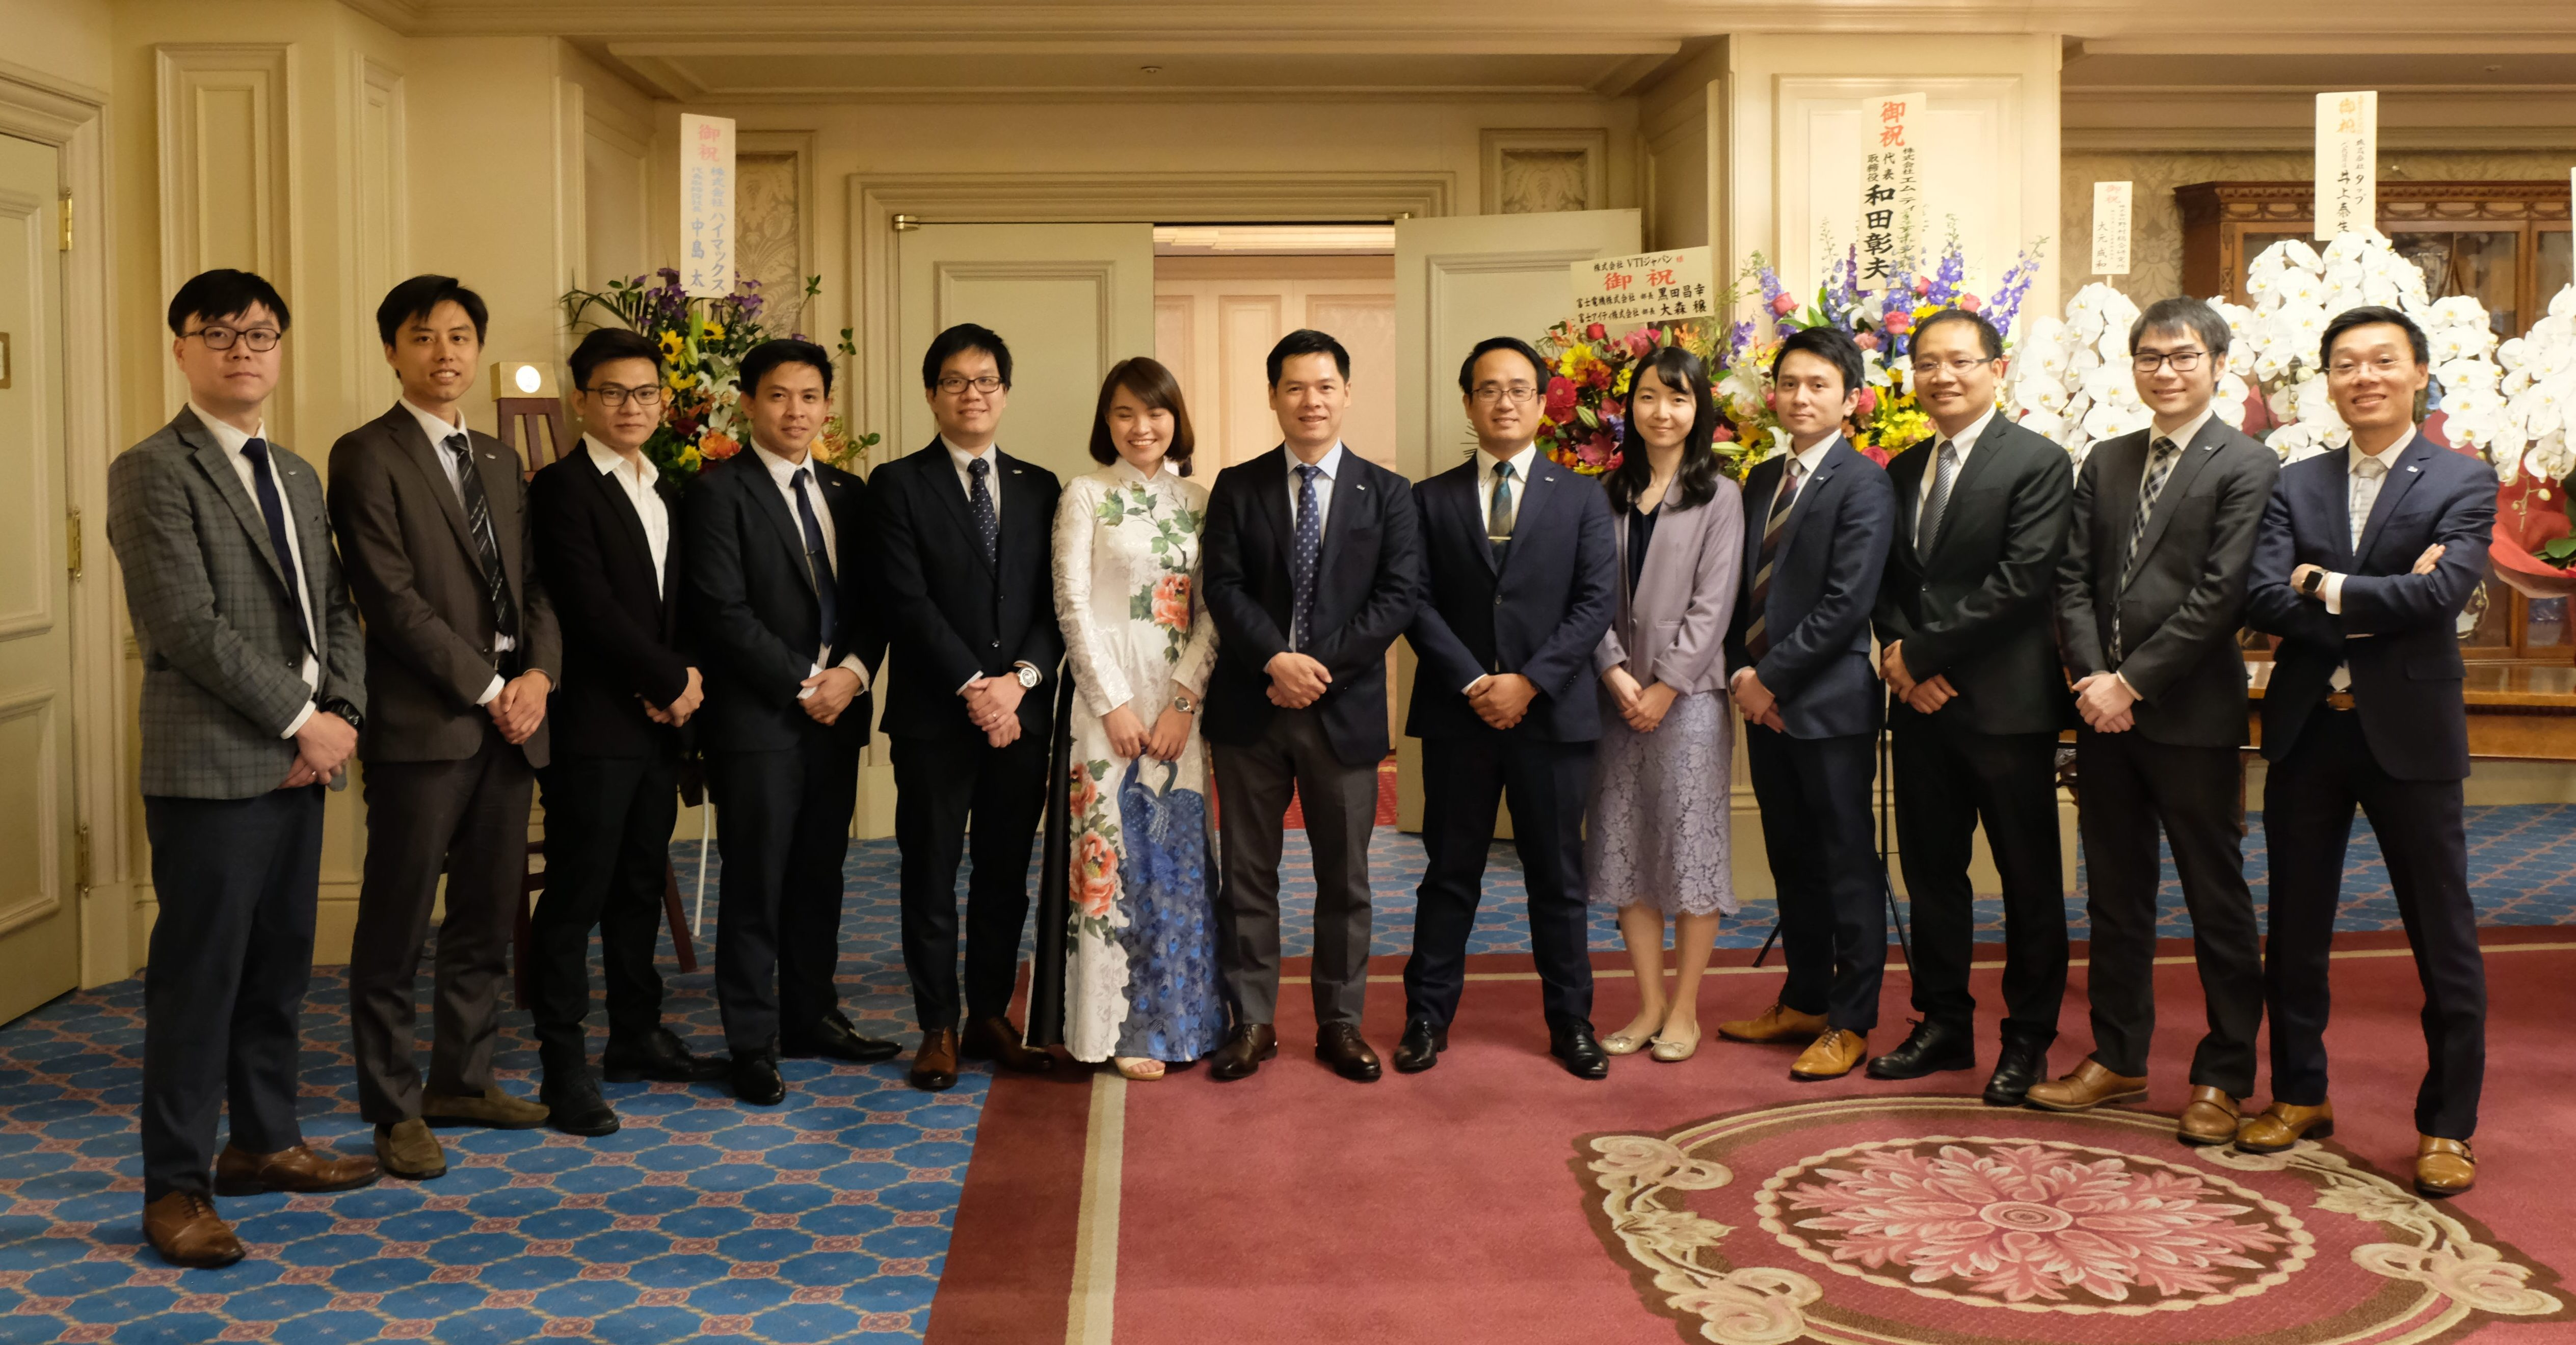 VTI Japan held Osaka Branch Opening Ceremony